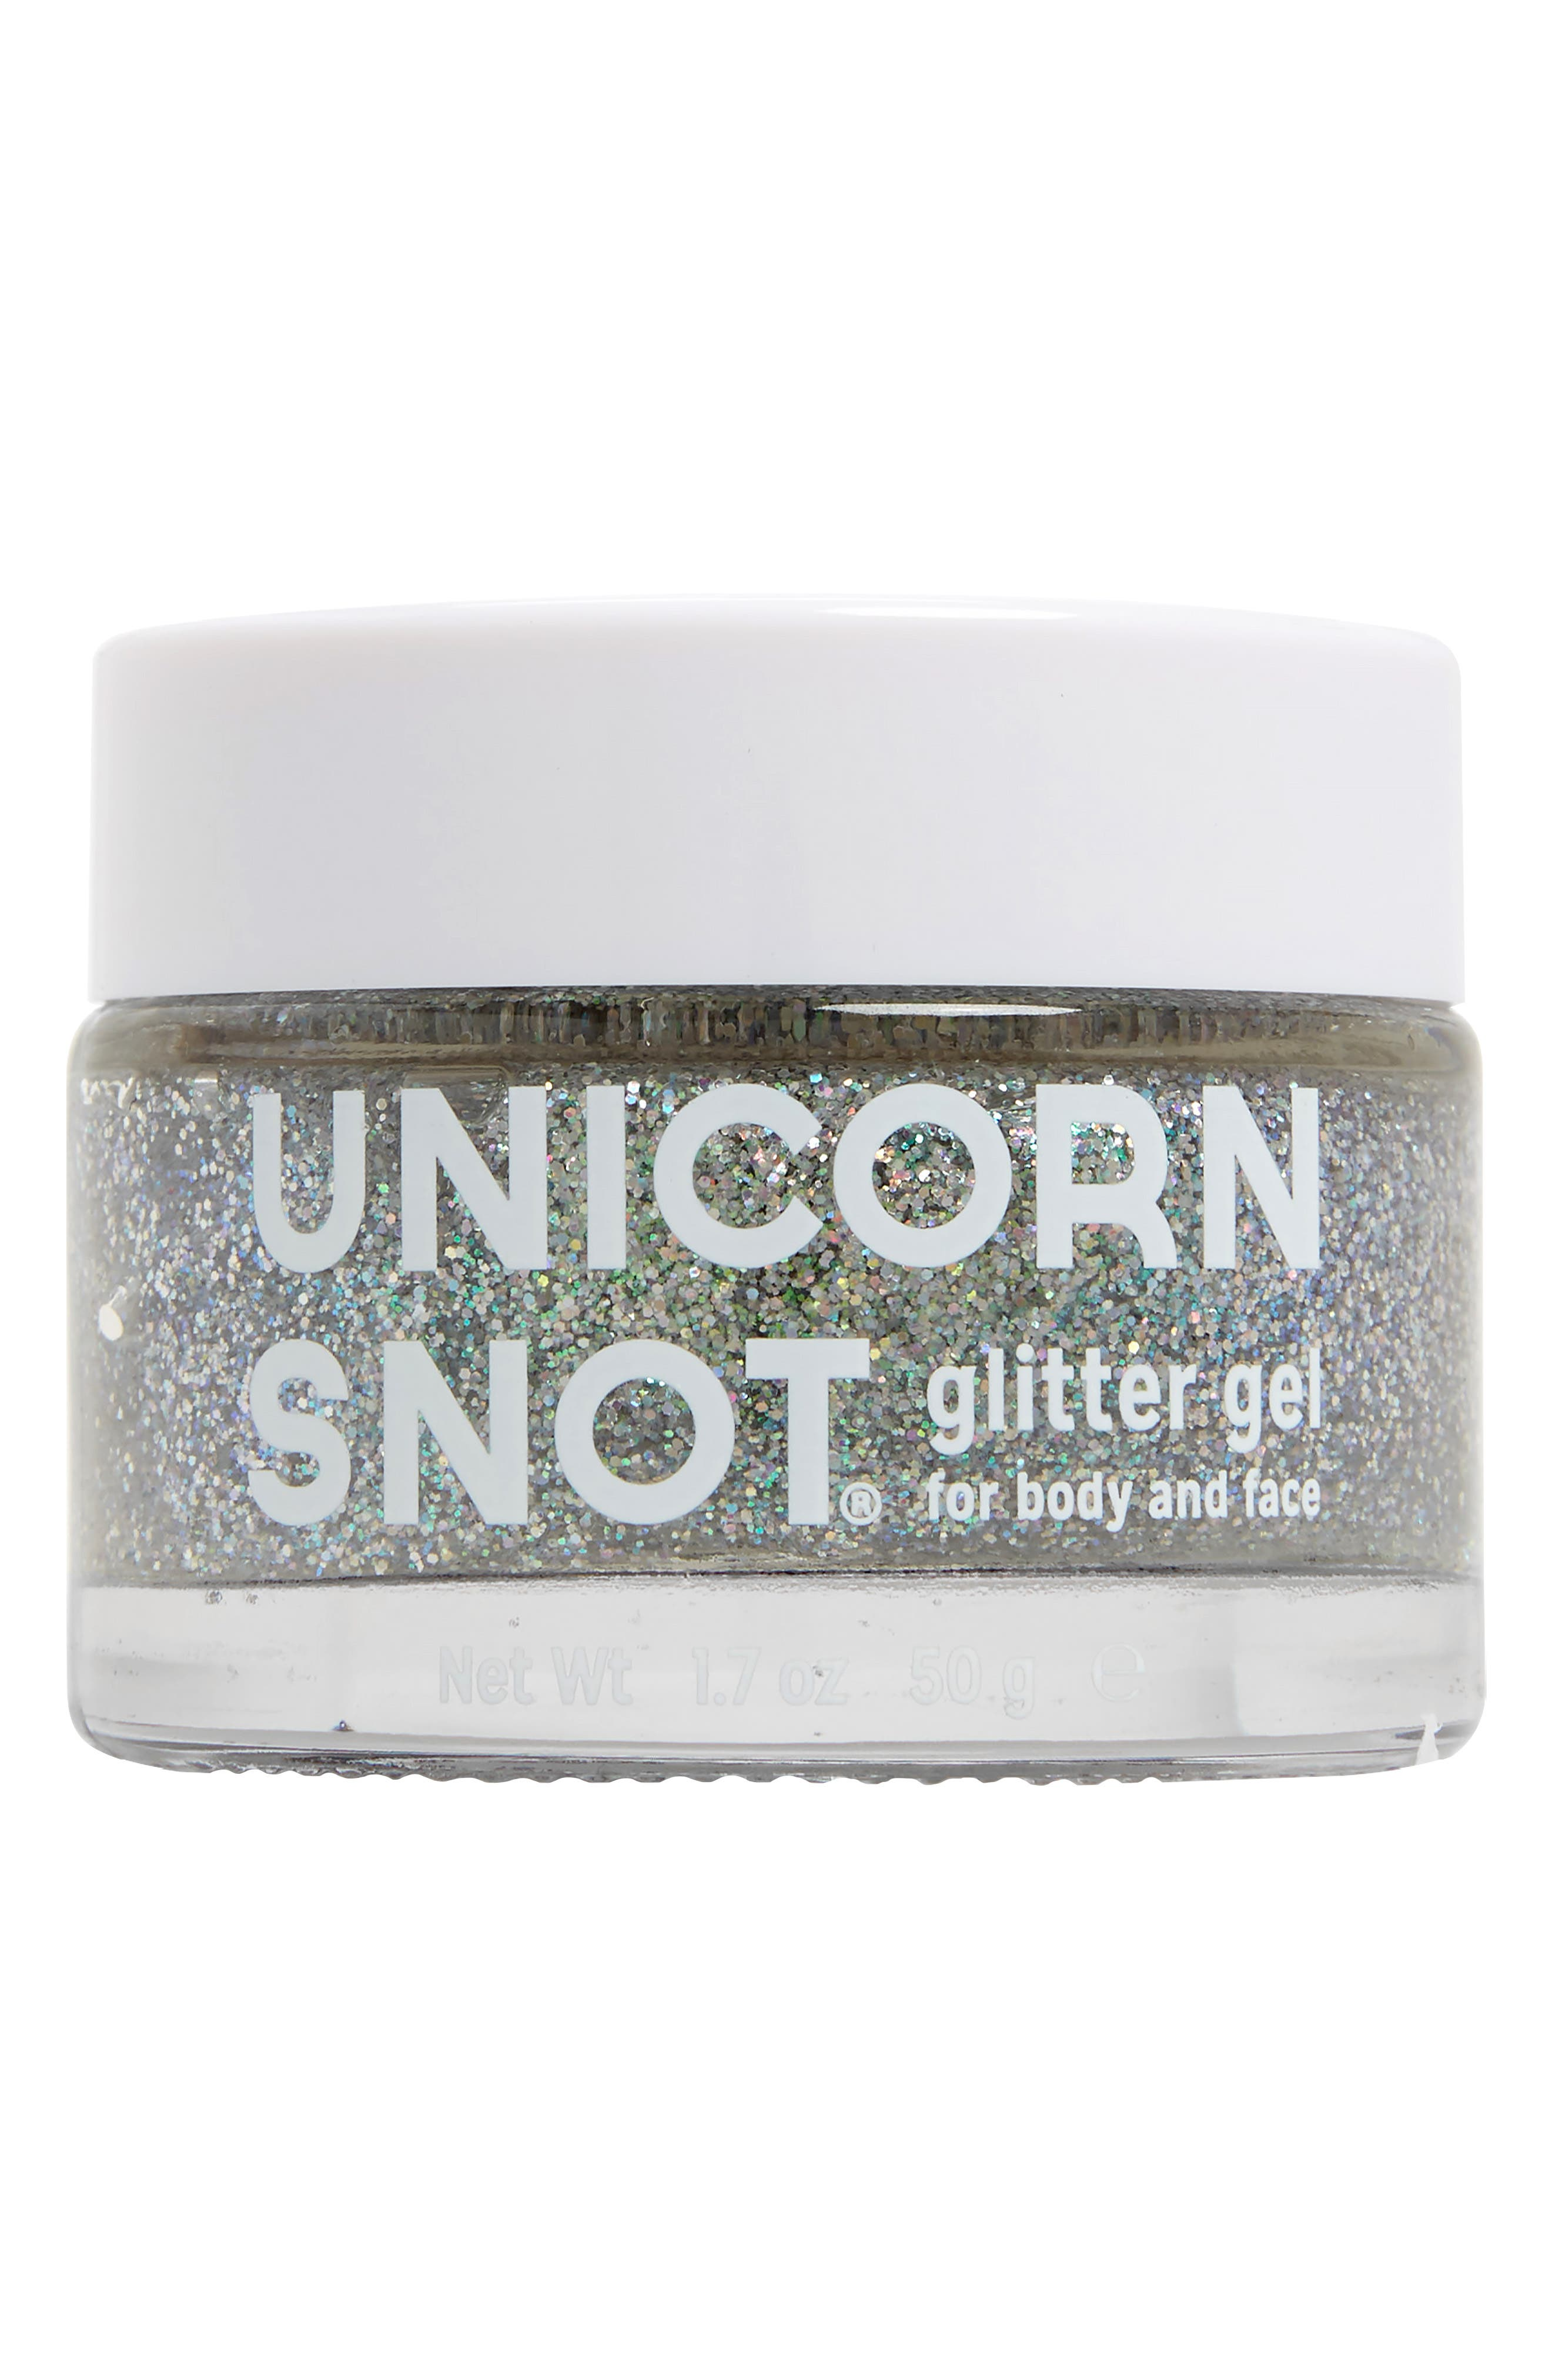 Unicorn Snot Glitter Gel,                             Main thumbnail 1, color,                             040